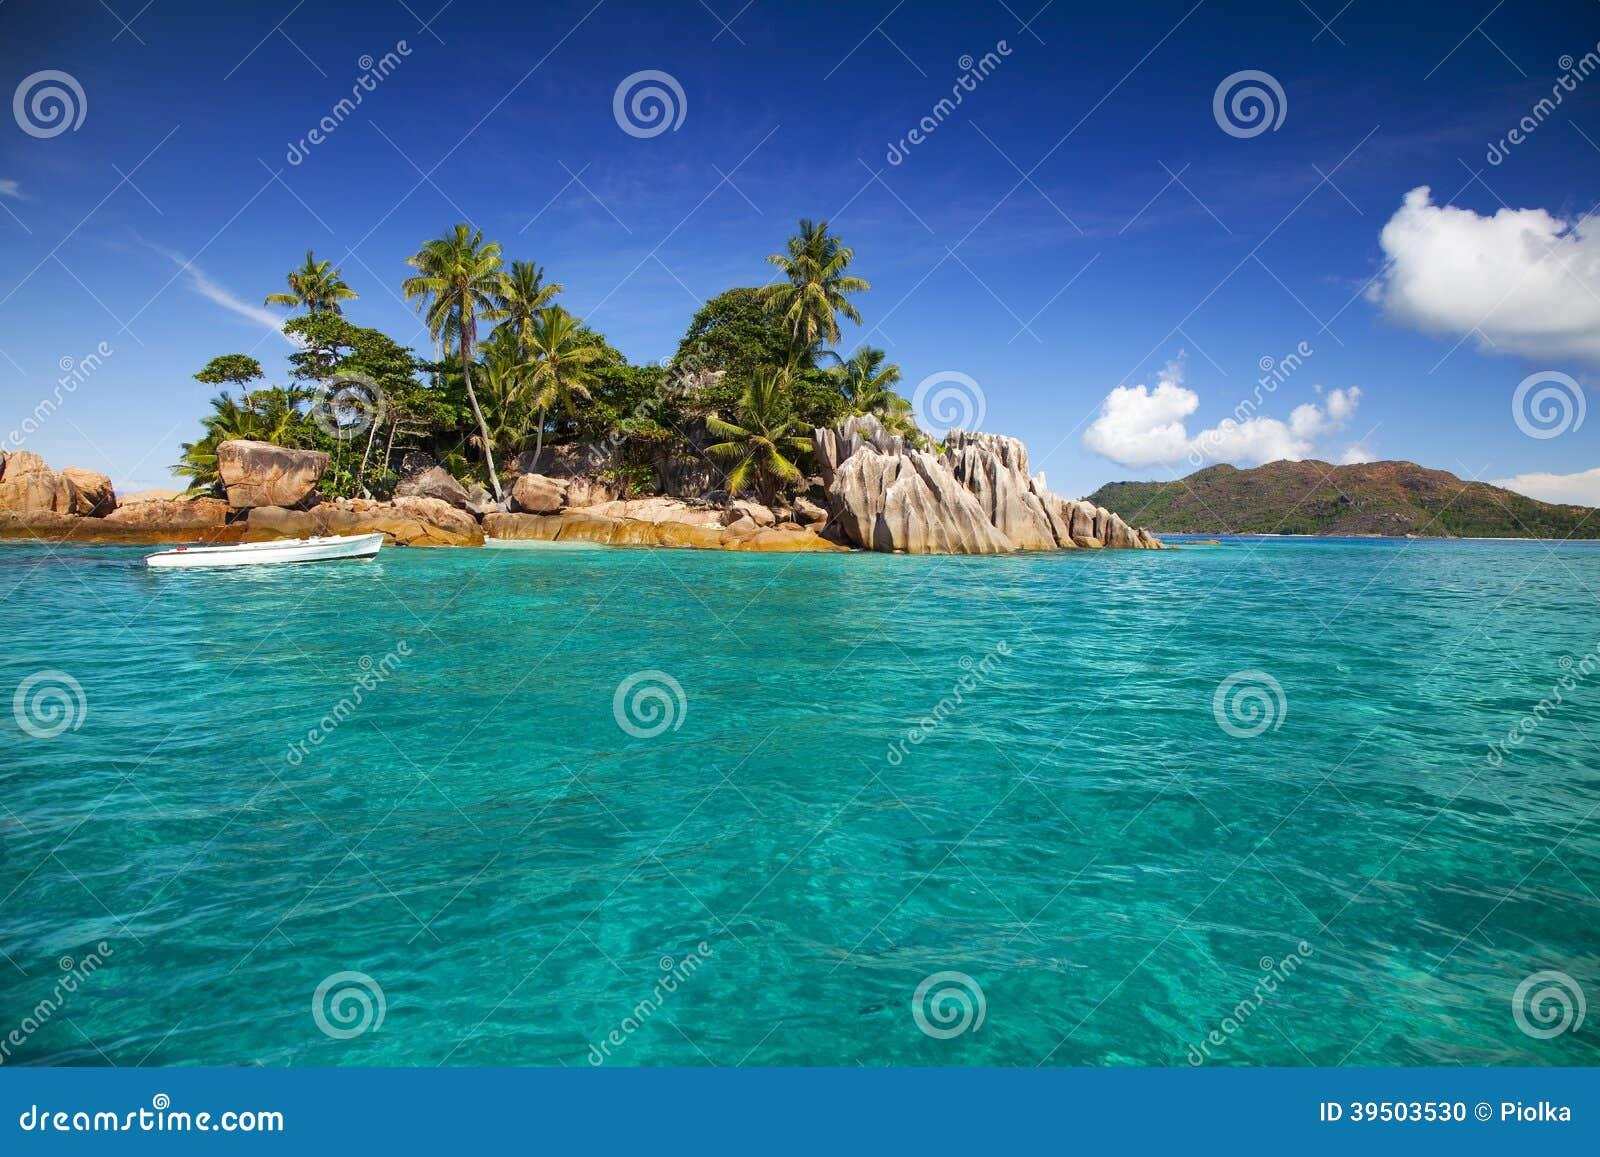 Beautiful little Island